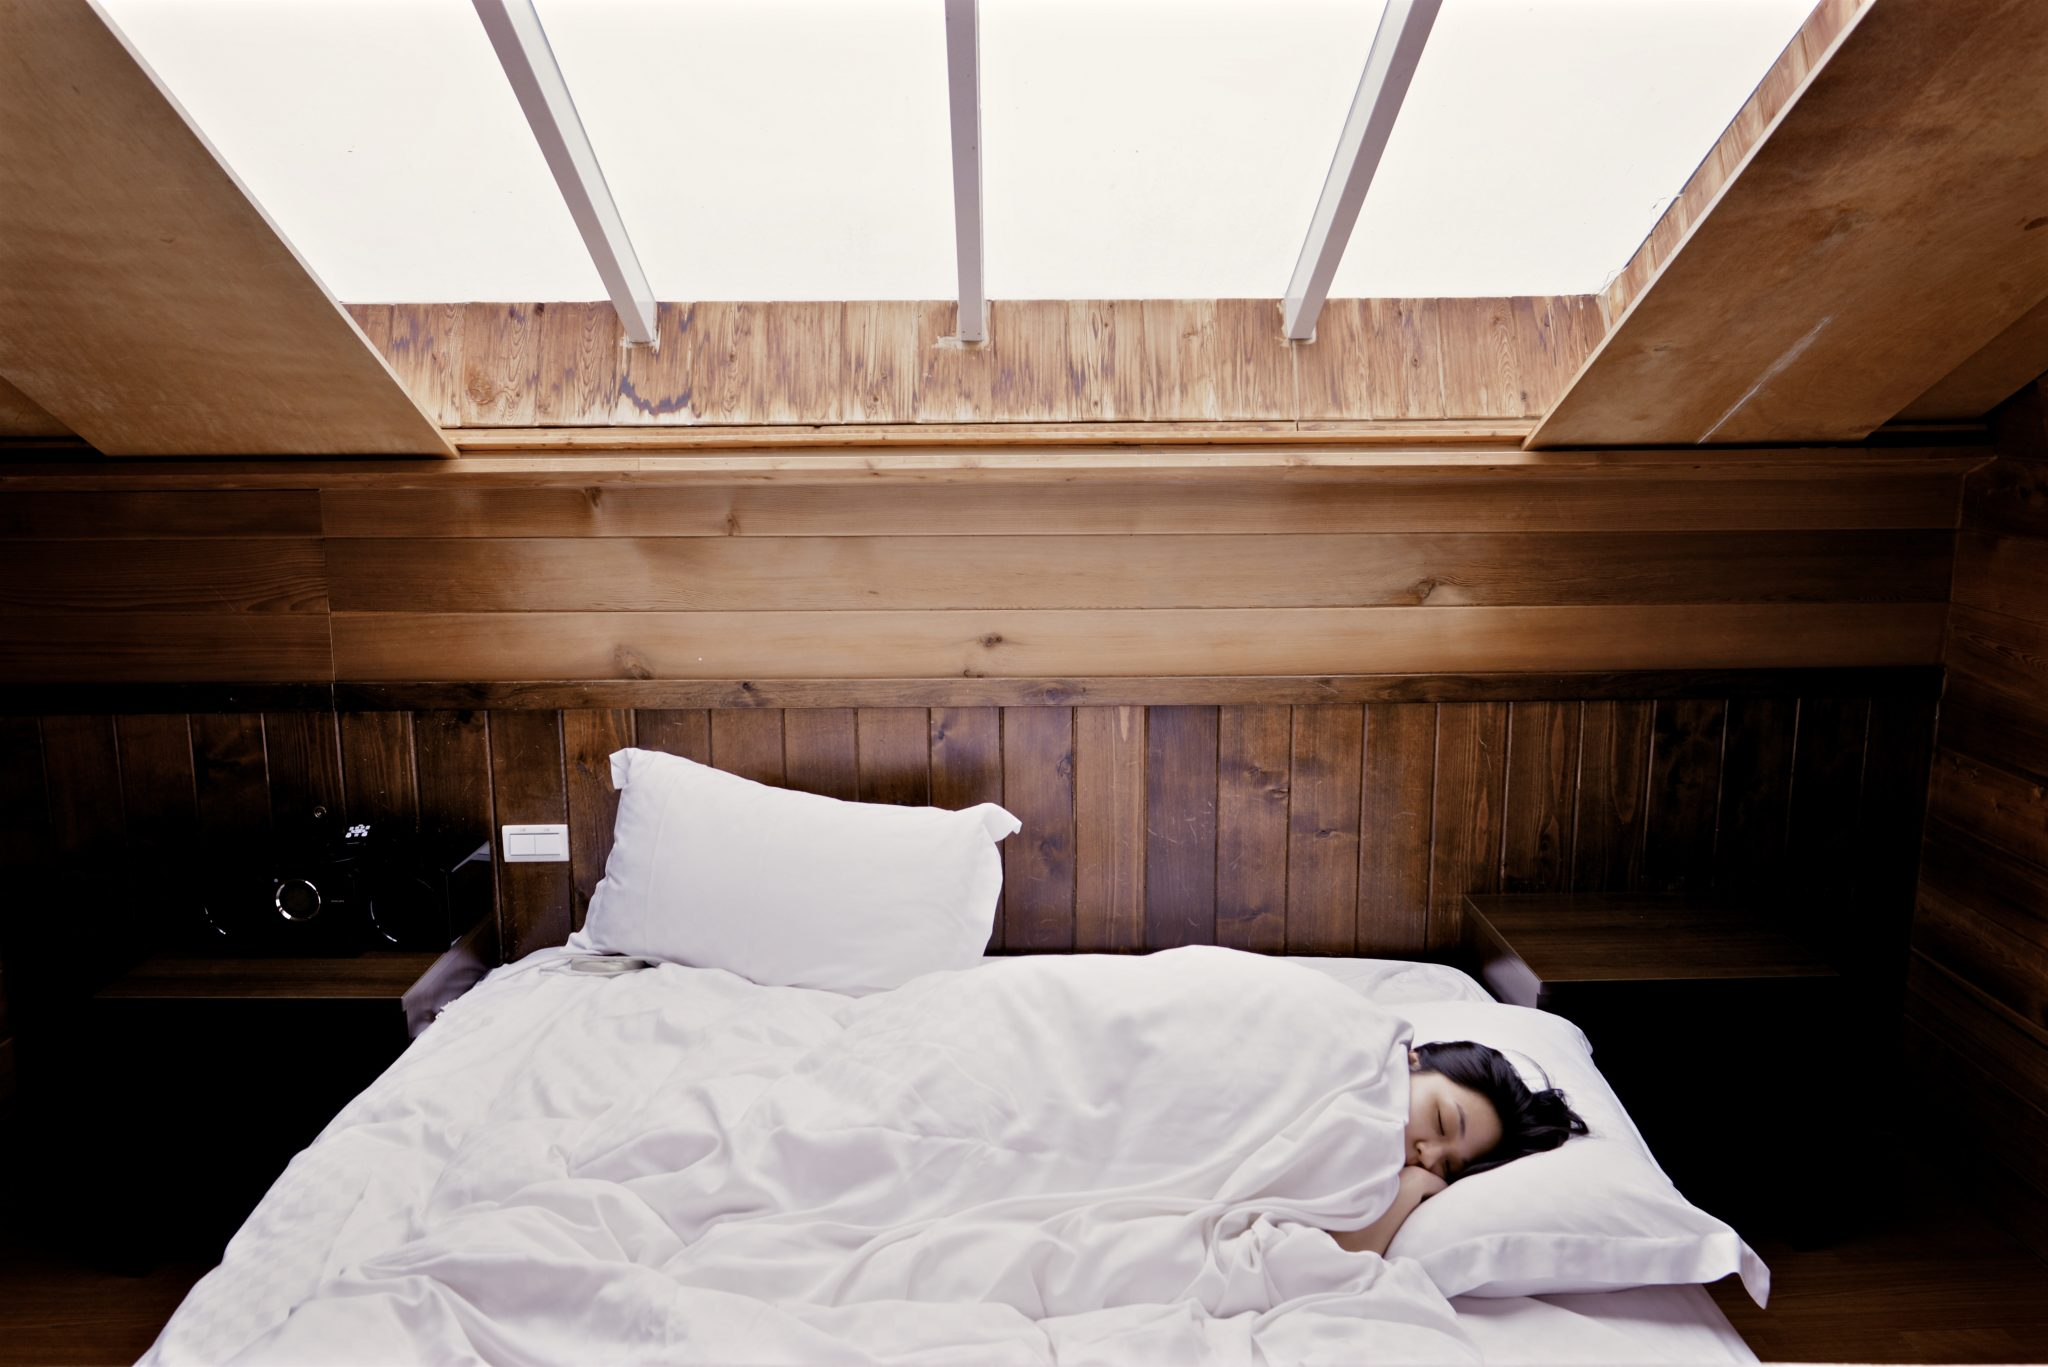 a-woman-sleeping-on-a-bed-sleeping-habits-post